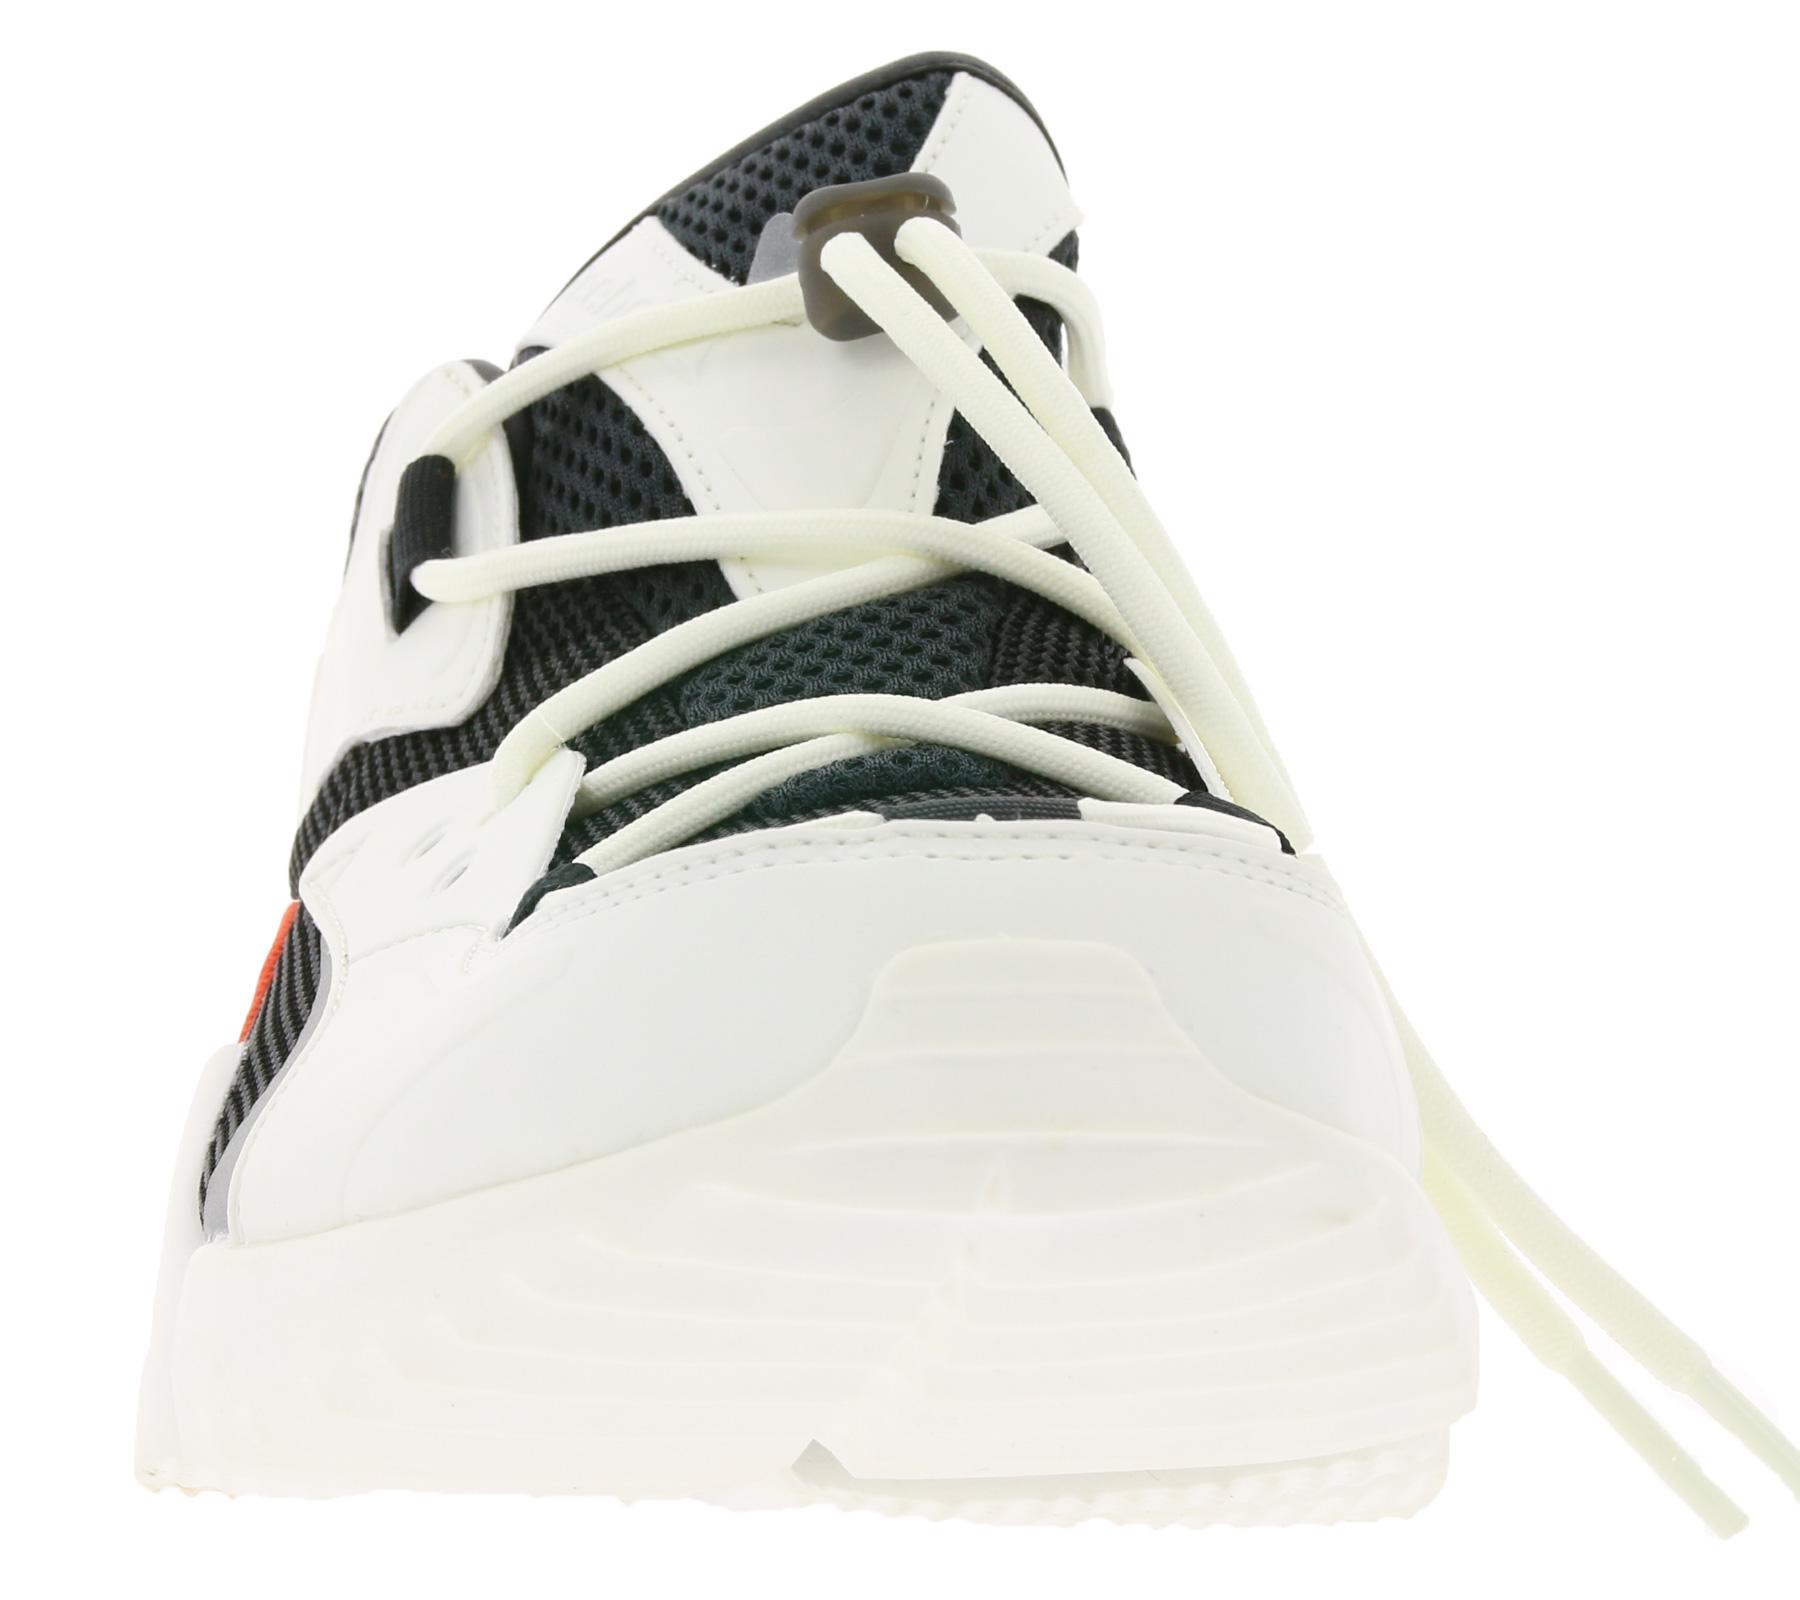 ff6ddfde593f4 Reebok Schuhe lässige Sneaker Run R 96 Weiß ...